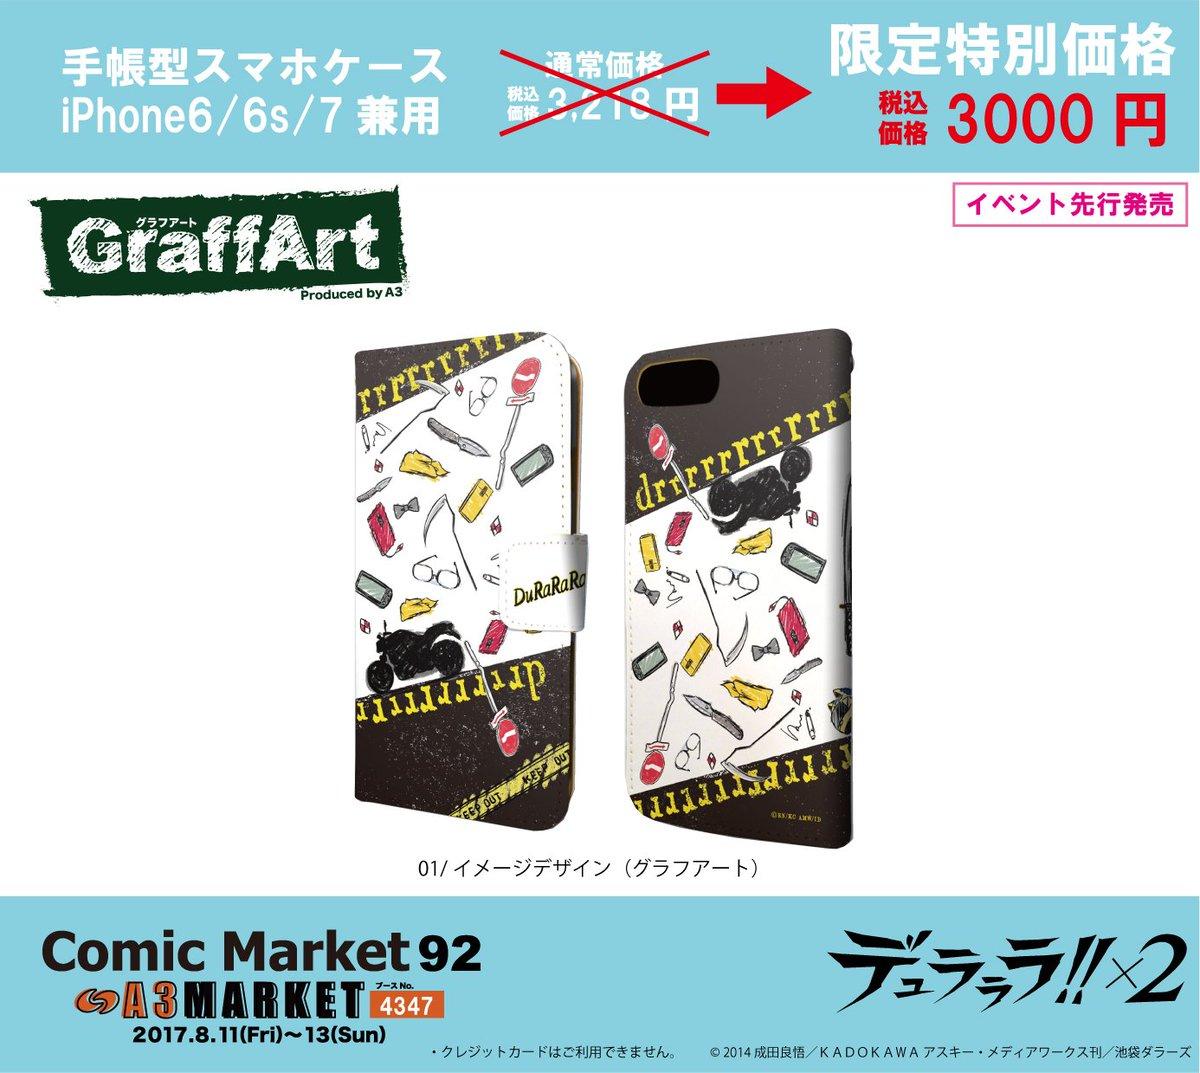 【C92事前通販】只今A3 MARKETにてA3オリジナルGraffArtシリーズの手帳型スマホケース(iPhone用)